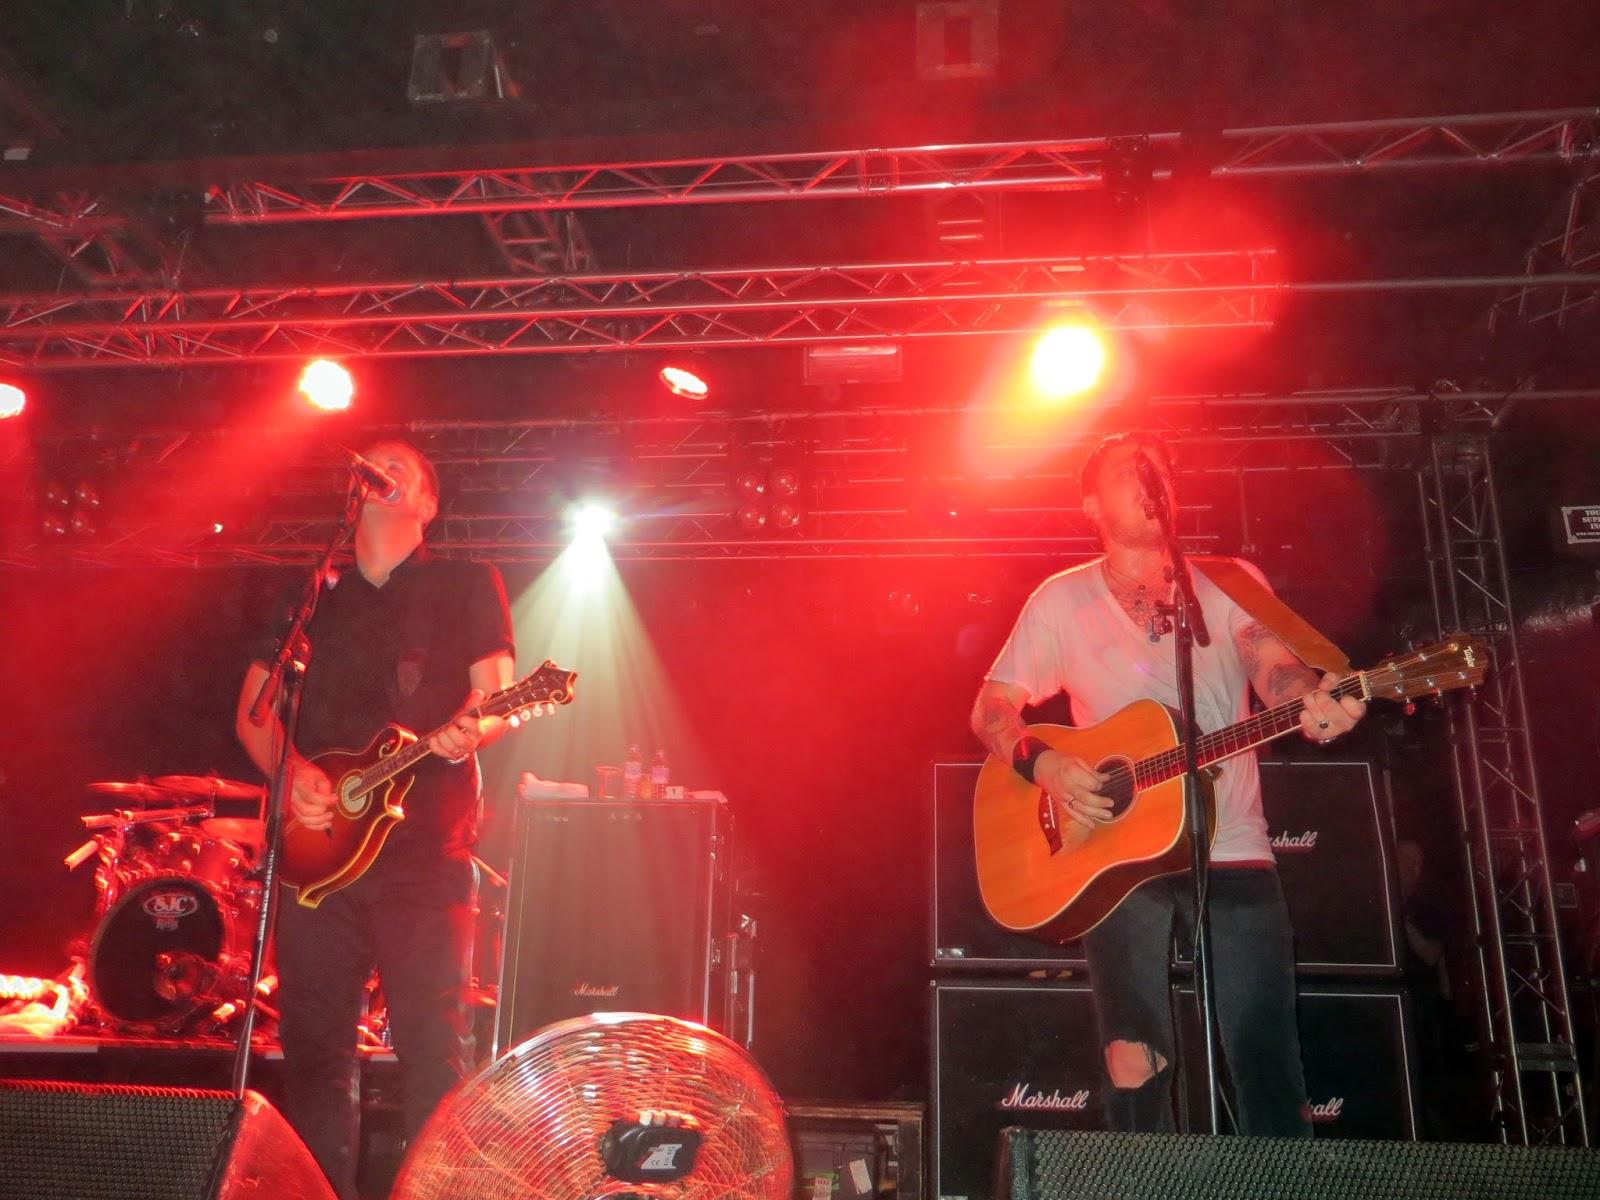 "Dropkick murphys, liverpool, ken casey, al barr, on stage, meeting band, gig, punk, celtic punk, boston, getting on stage with the dropkick murphys, bands, live music, atmosphere, close, barrier, rail, front row, Matt Kelly, James Lynch, Tim Brennan, Josh ""Scruffy"" Wallace, Jeff DaRosa, banjos, irish music, bagpipes,"